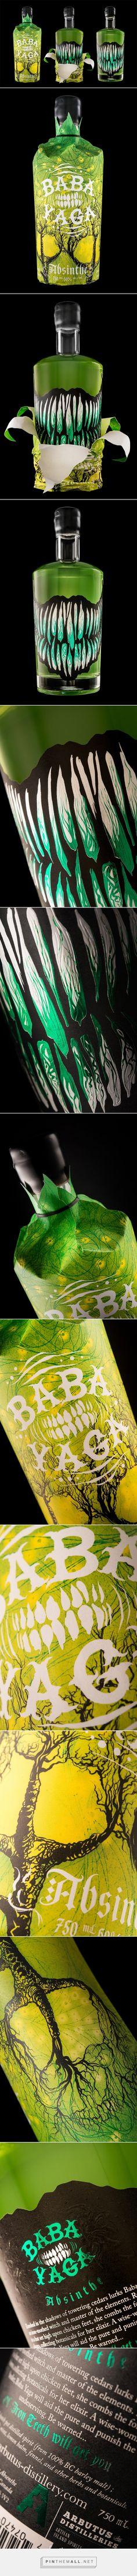 Baba Yaga #Absinthe #packaging by Hired Guns Creative - http://www.packagingoftheworld.com/2015/02/baba-yaga-absinthe.html